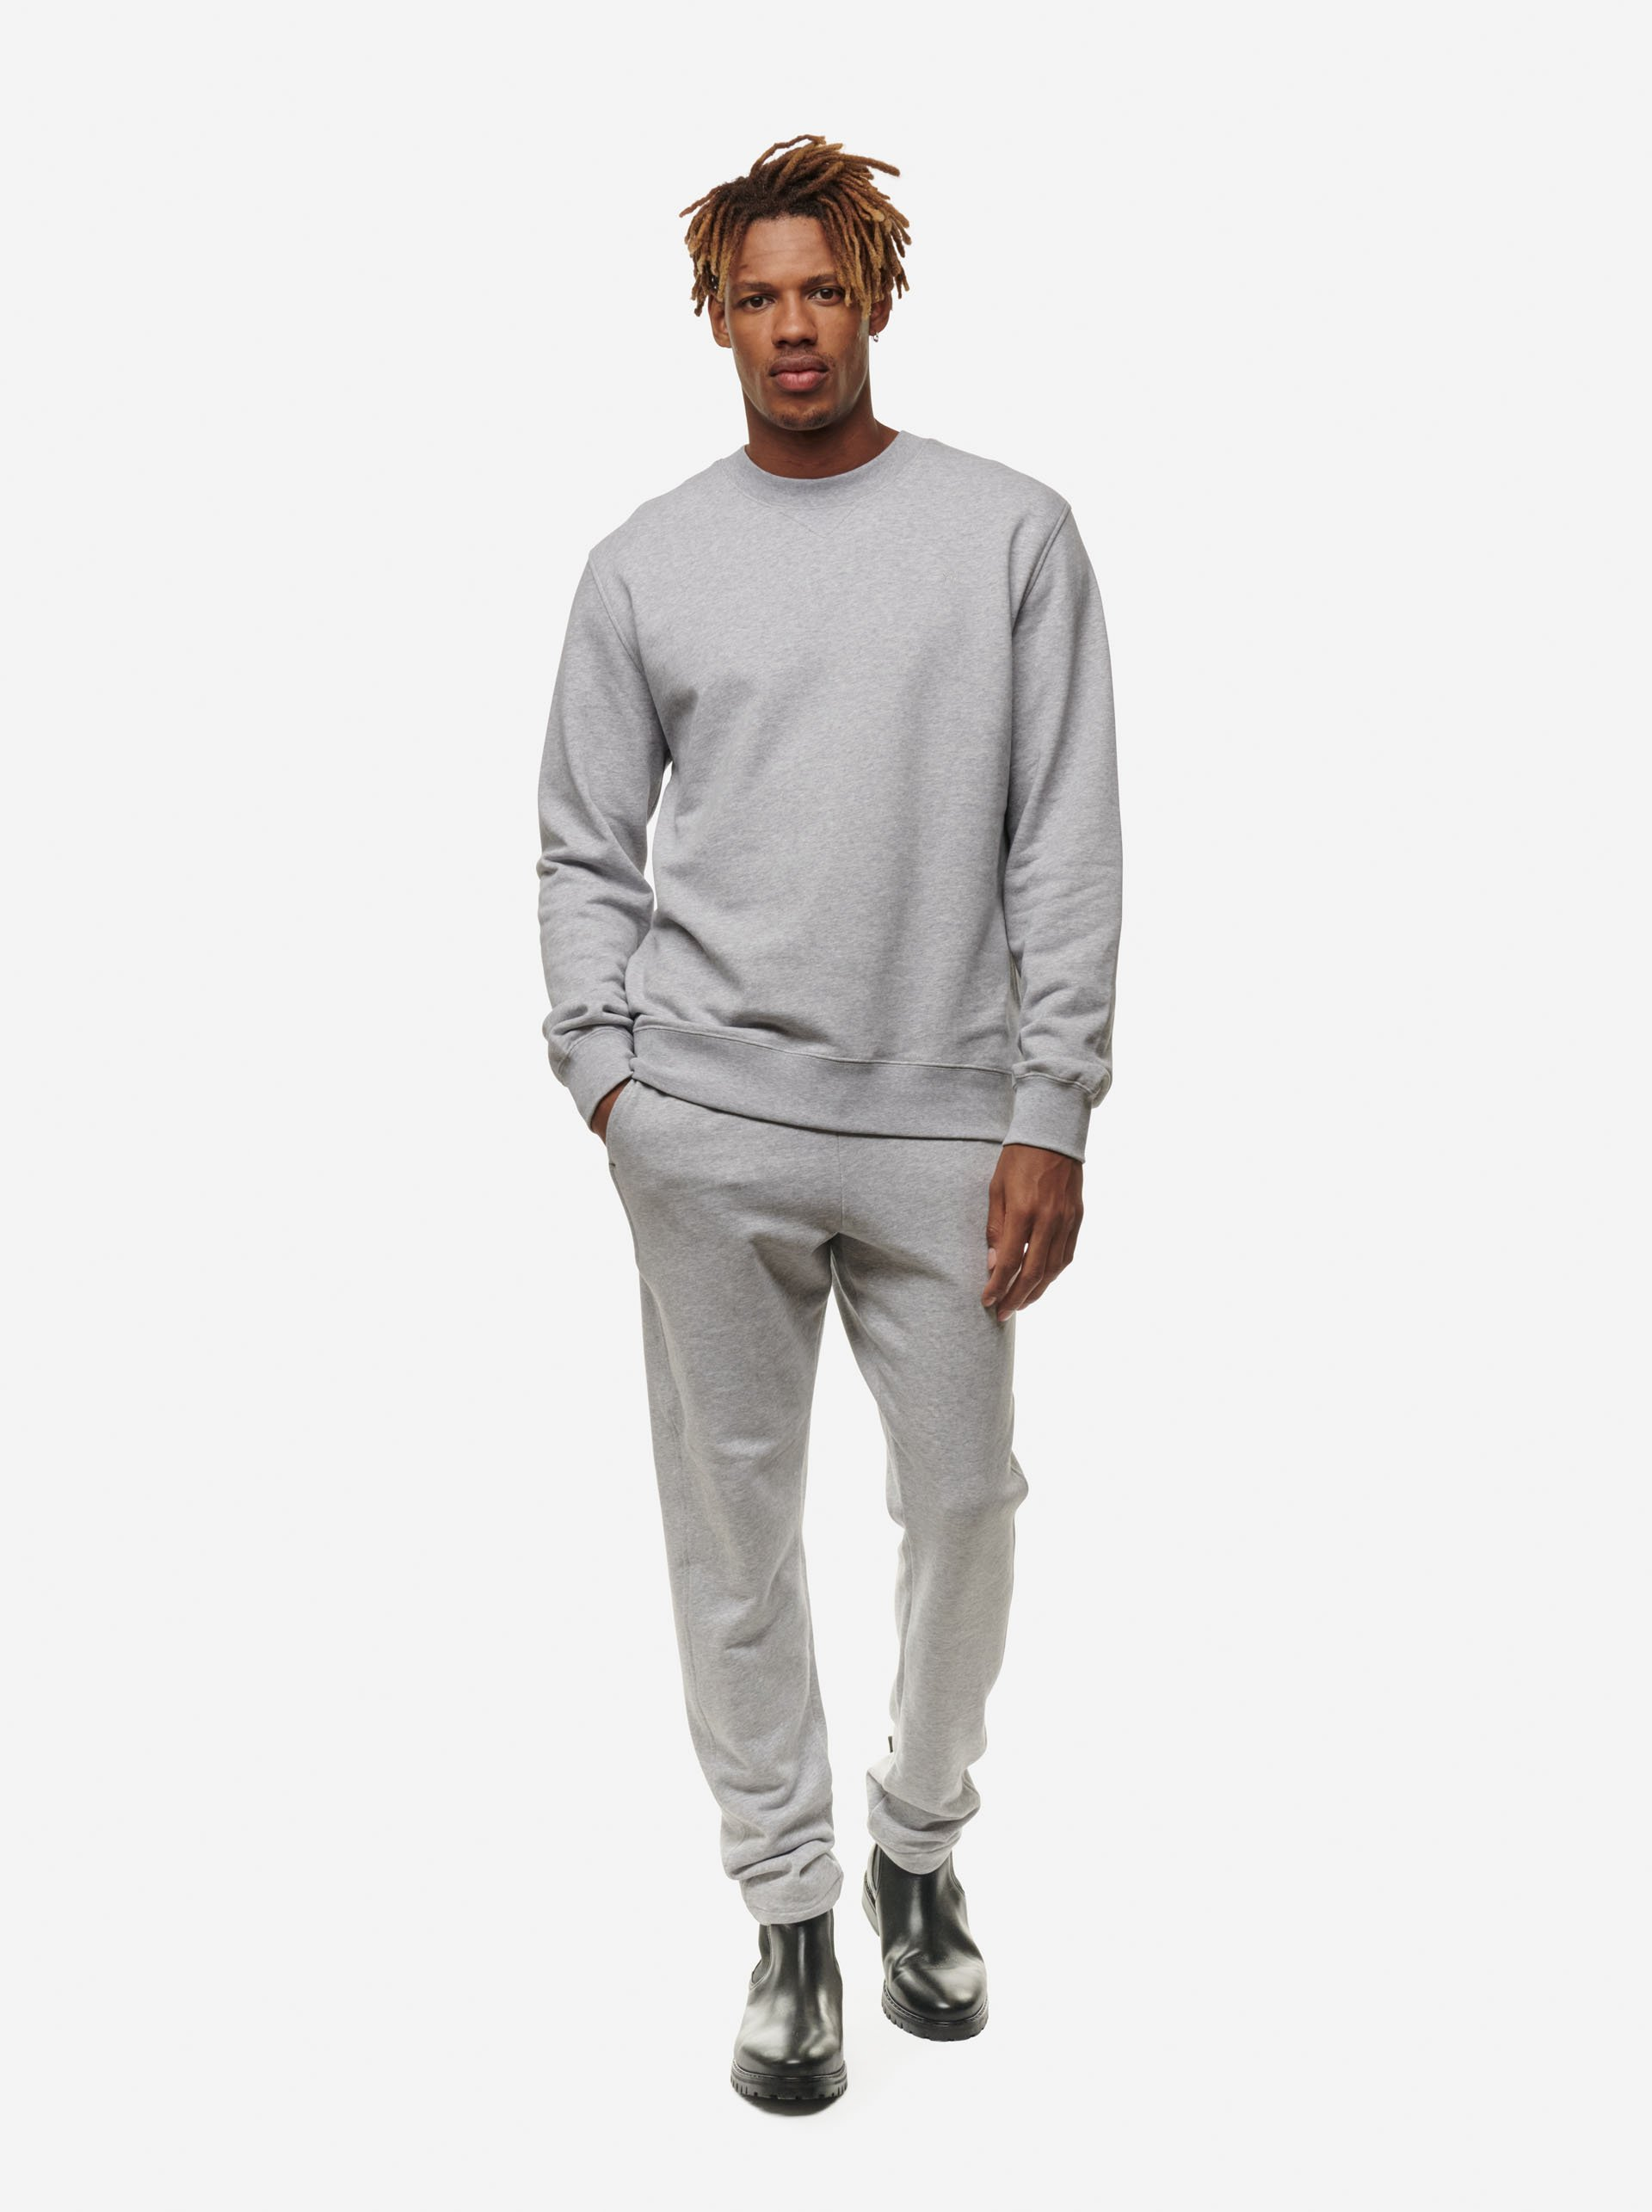 Teym-TheSweatshirt-Men-Grey05